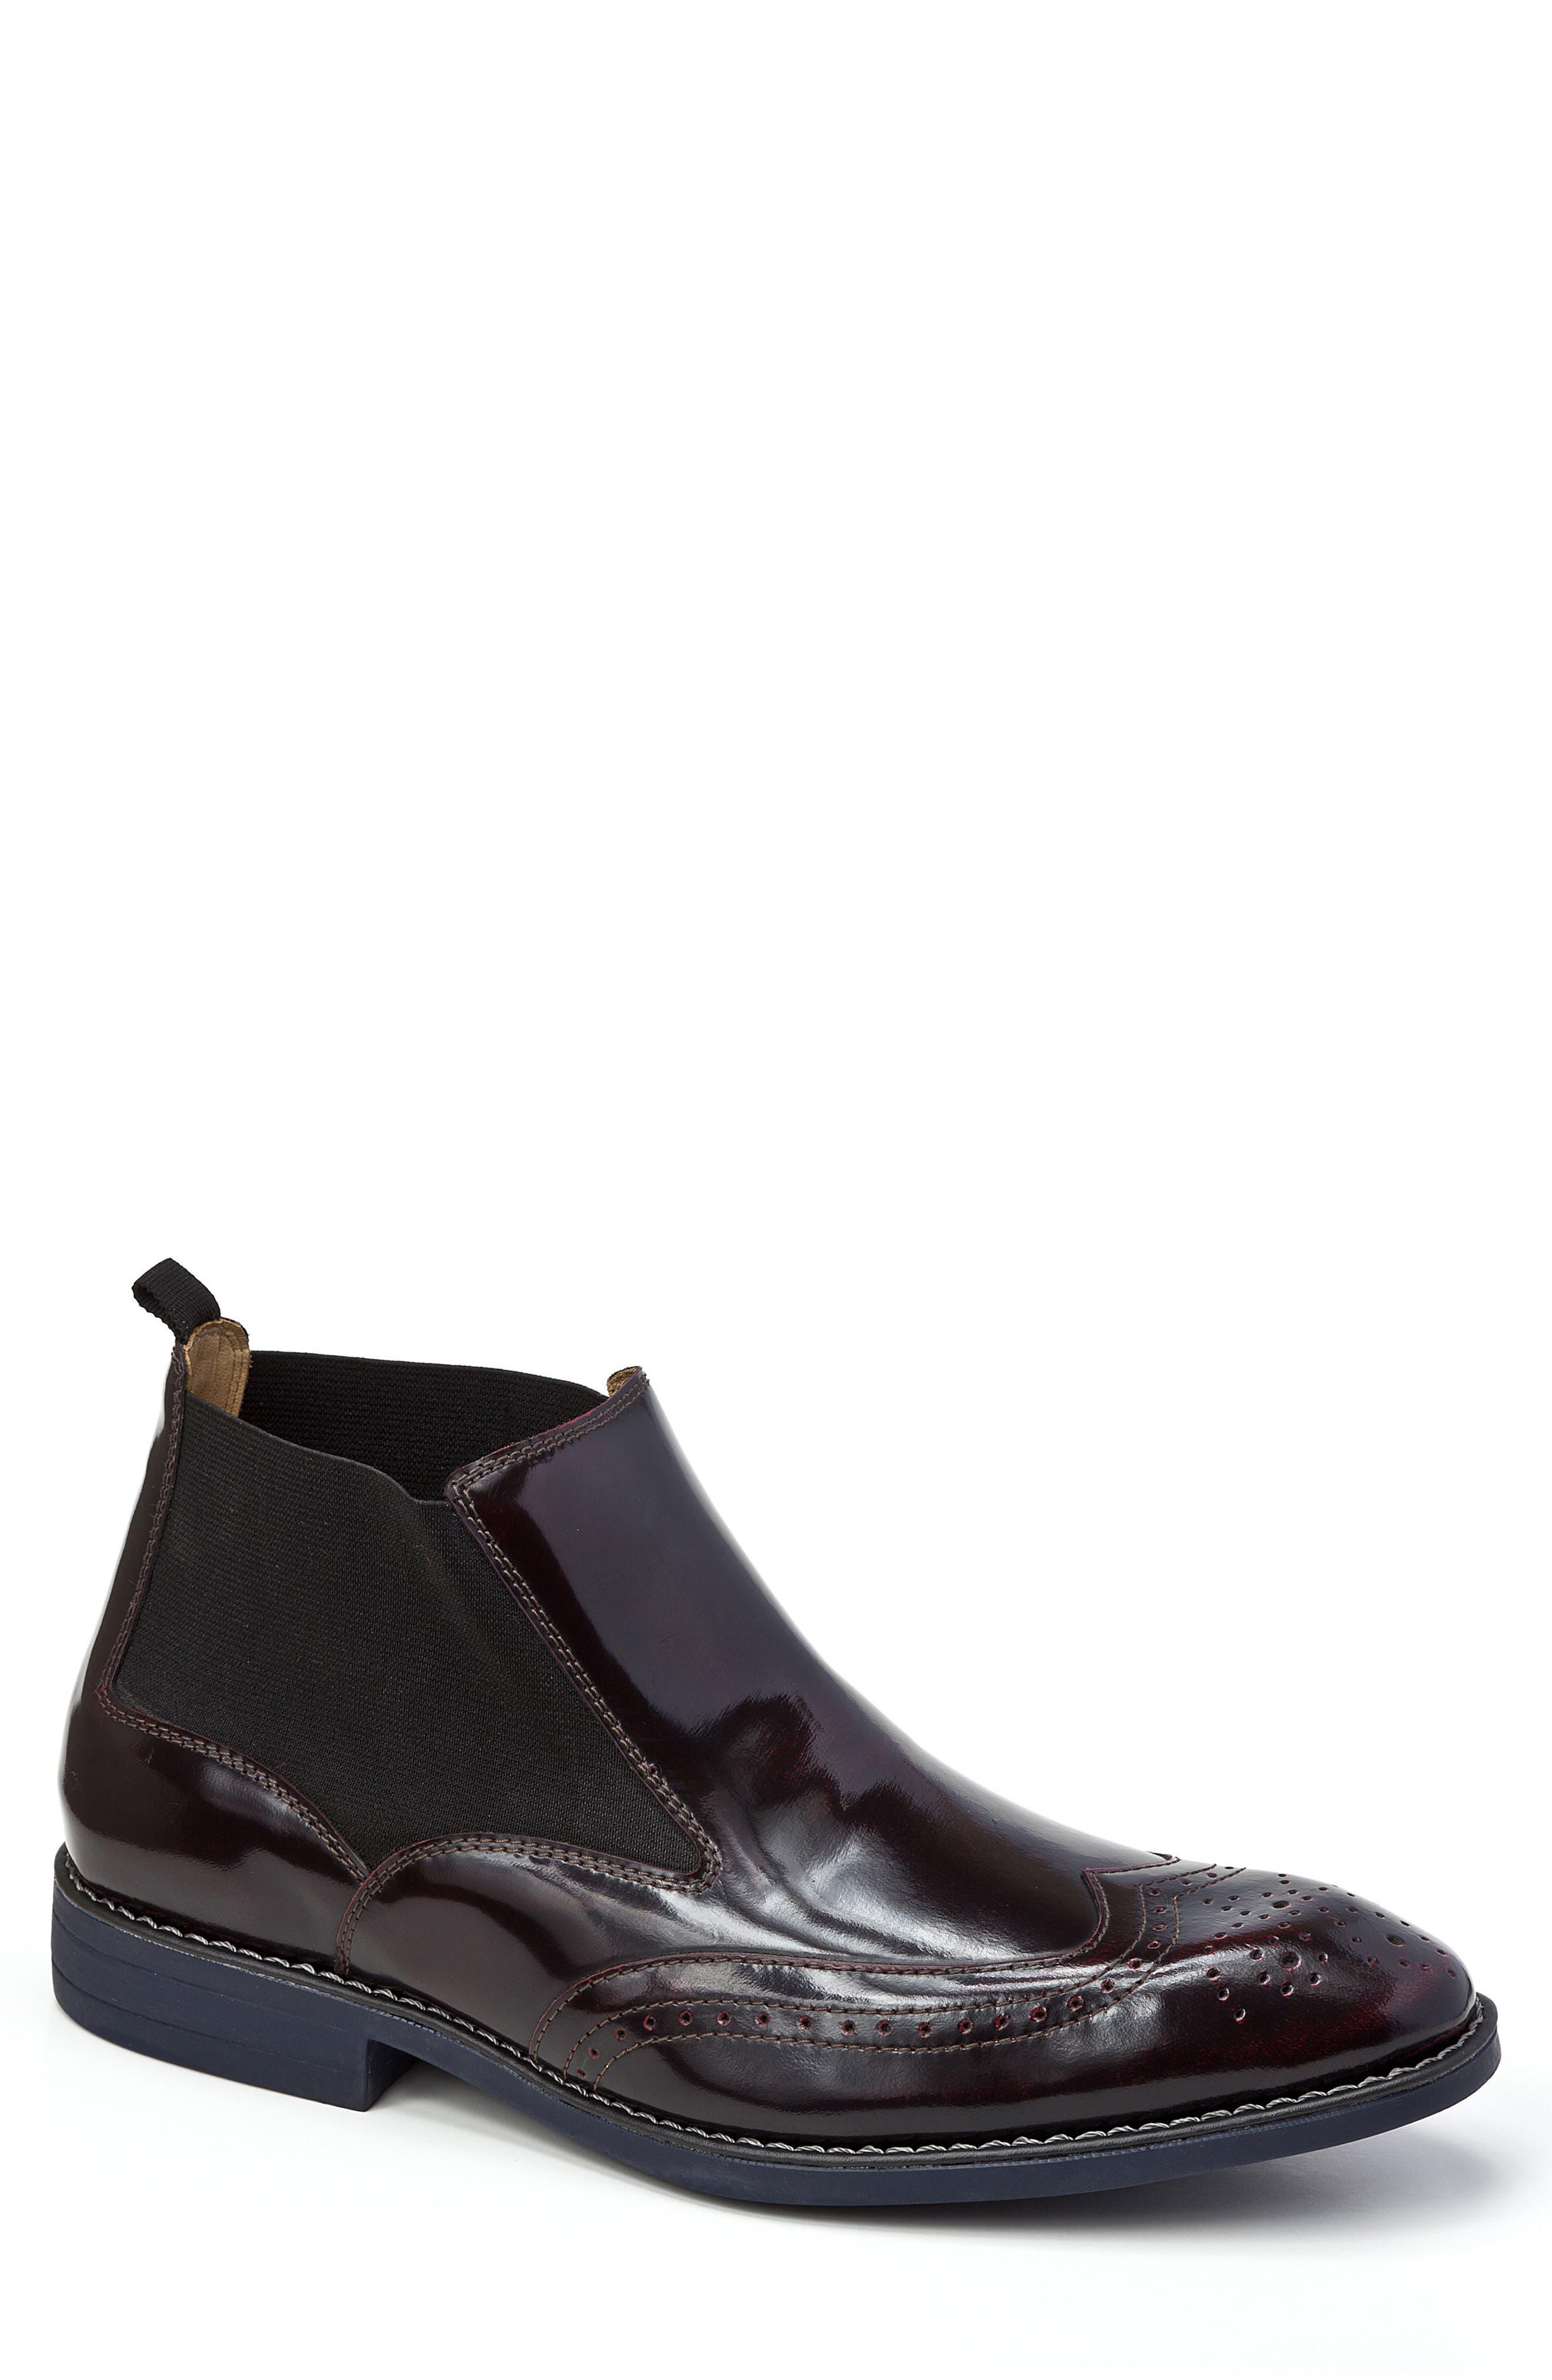 Emanuel Chelsea Boot,                         Main,                         color, Vino Leather